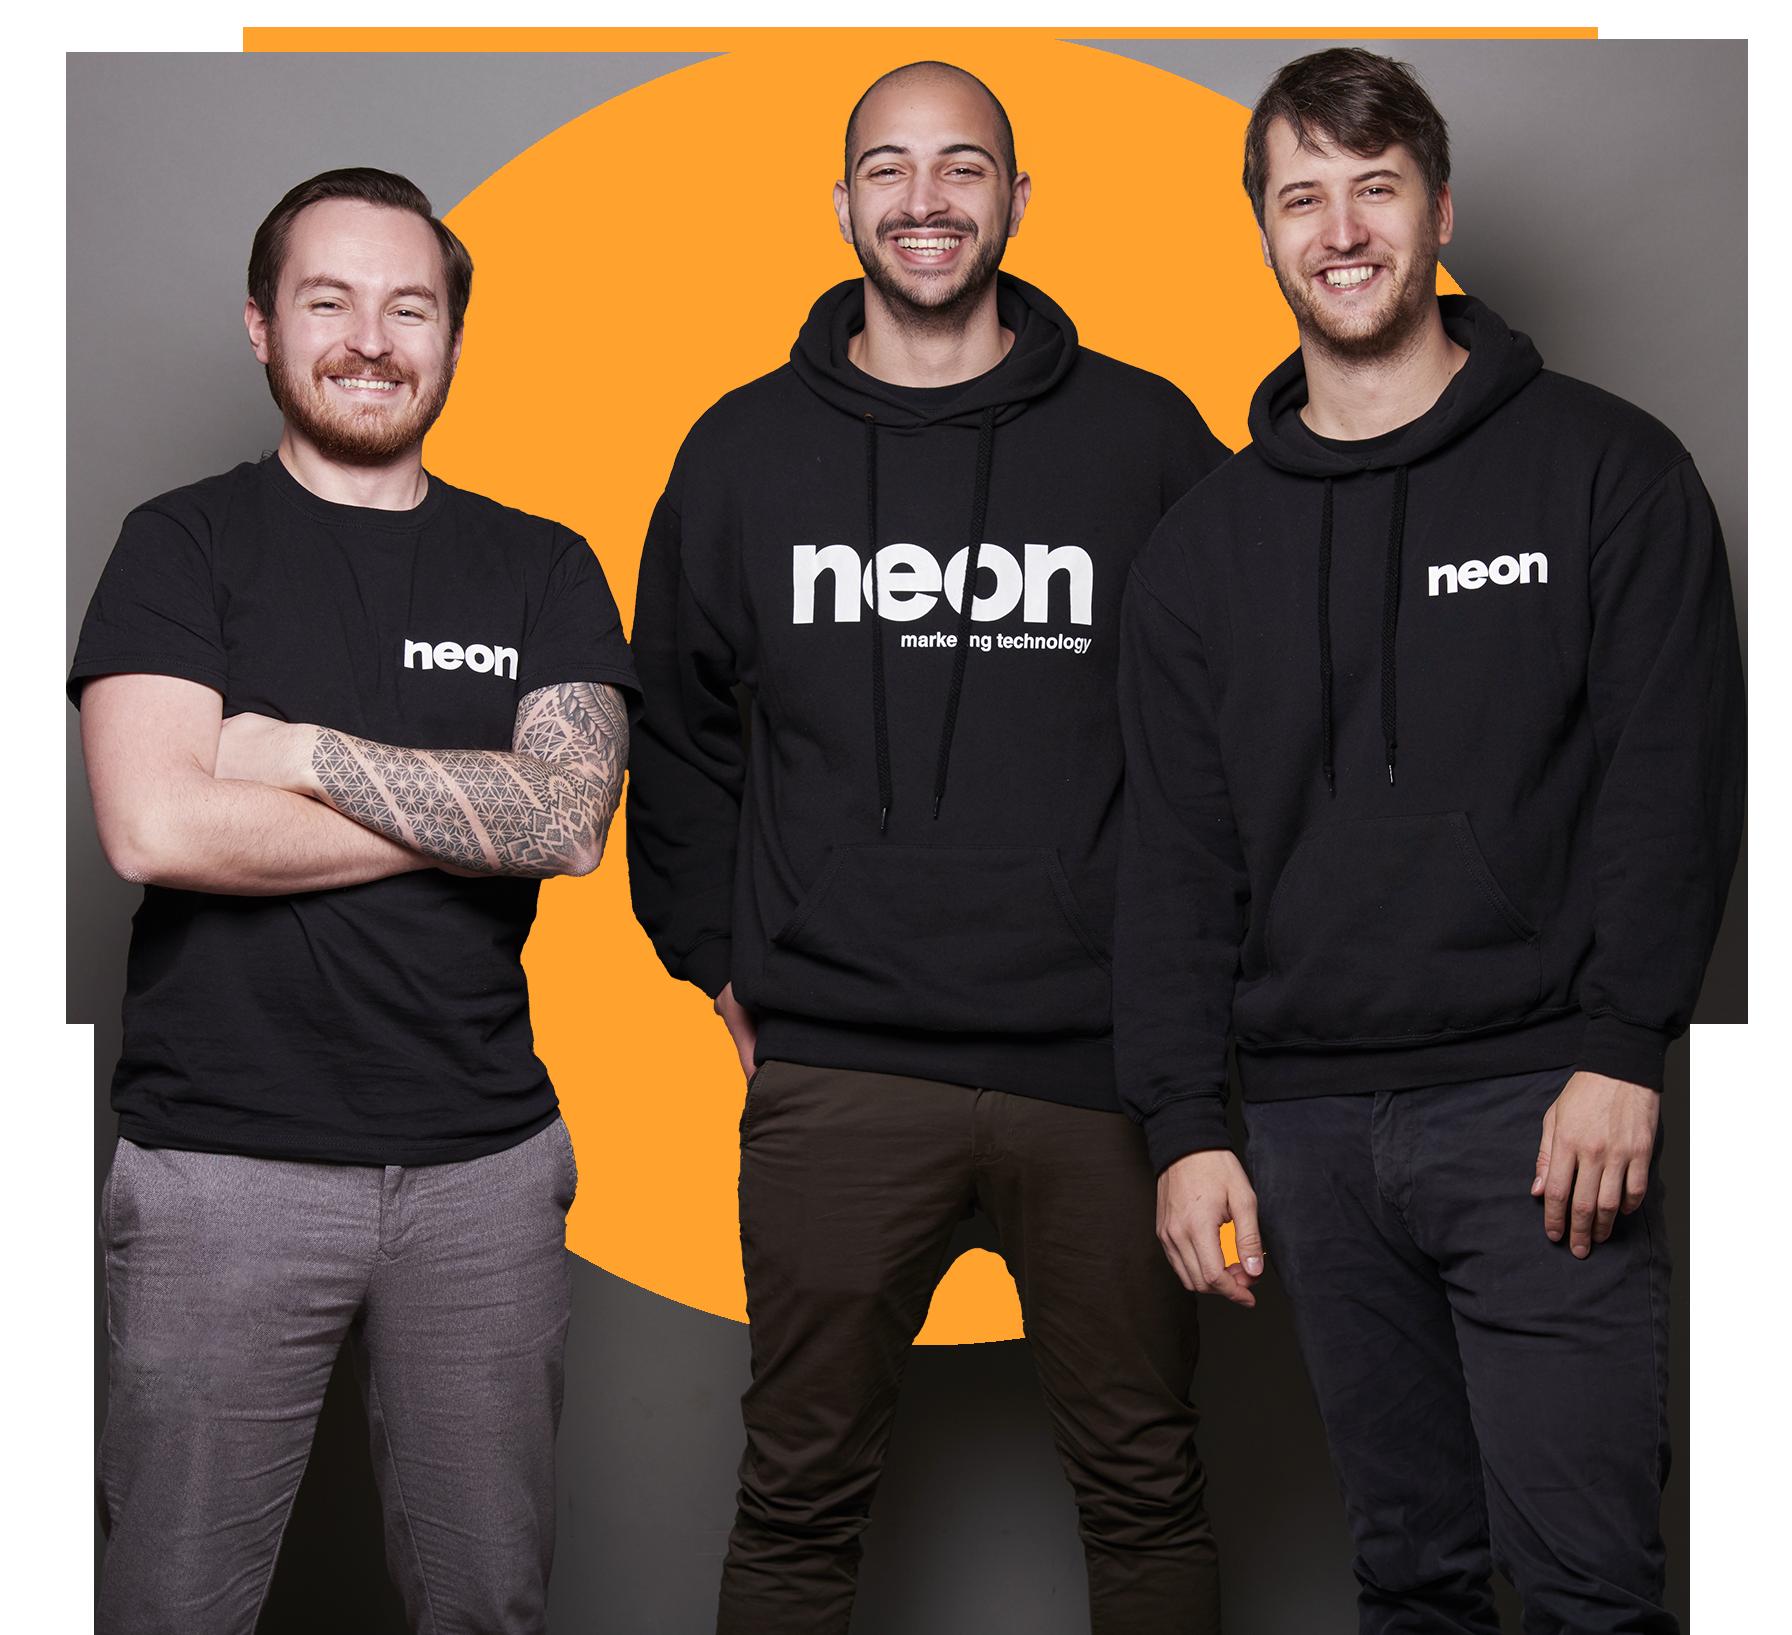 neon marketing technology team